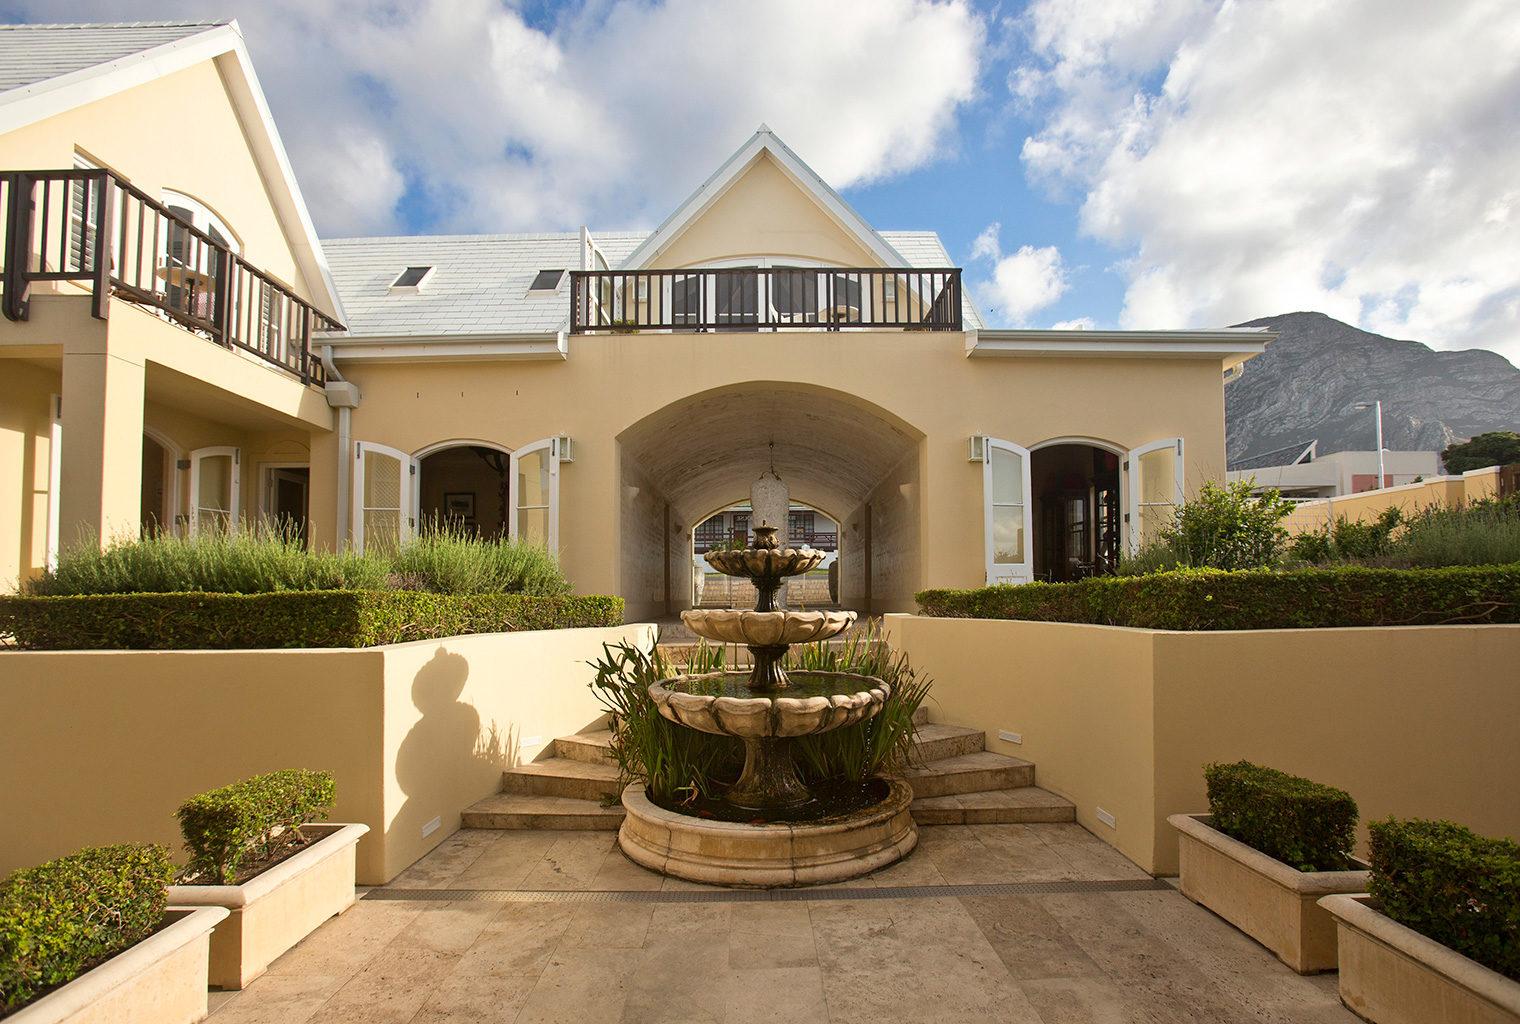 Birkenhead-House-South-Africa-Entrance